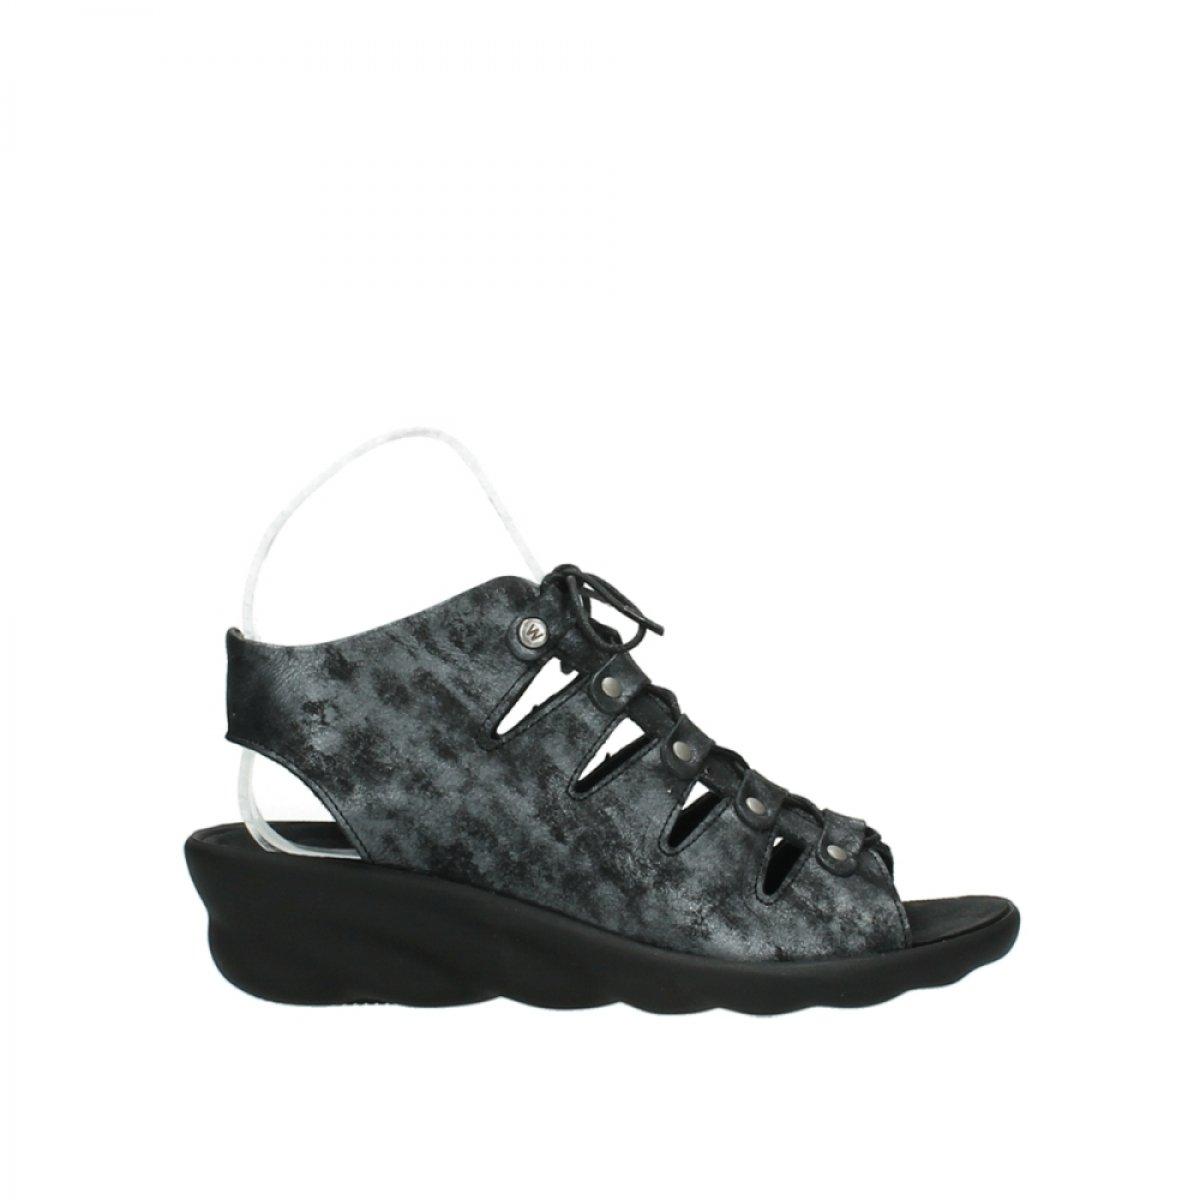 Wolky Comfort Arena - 10000 black/anthracite nubuck - 38